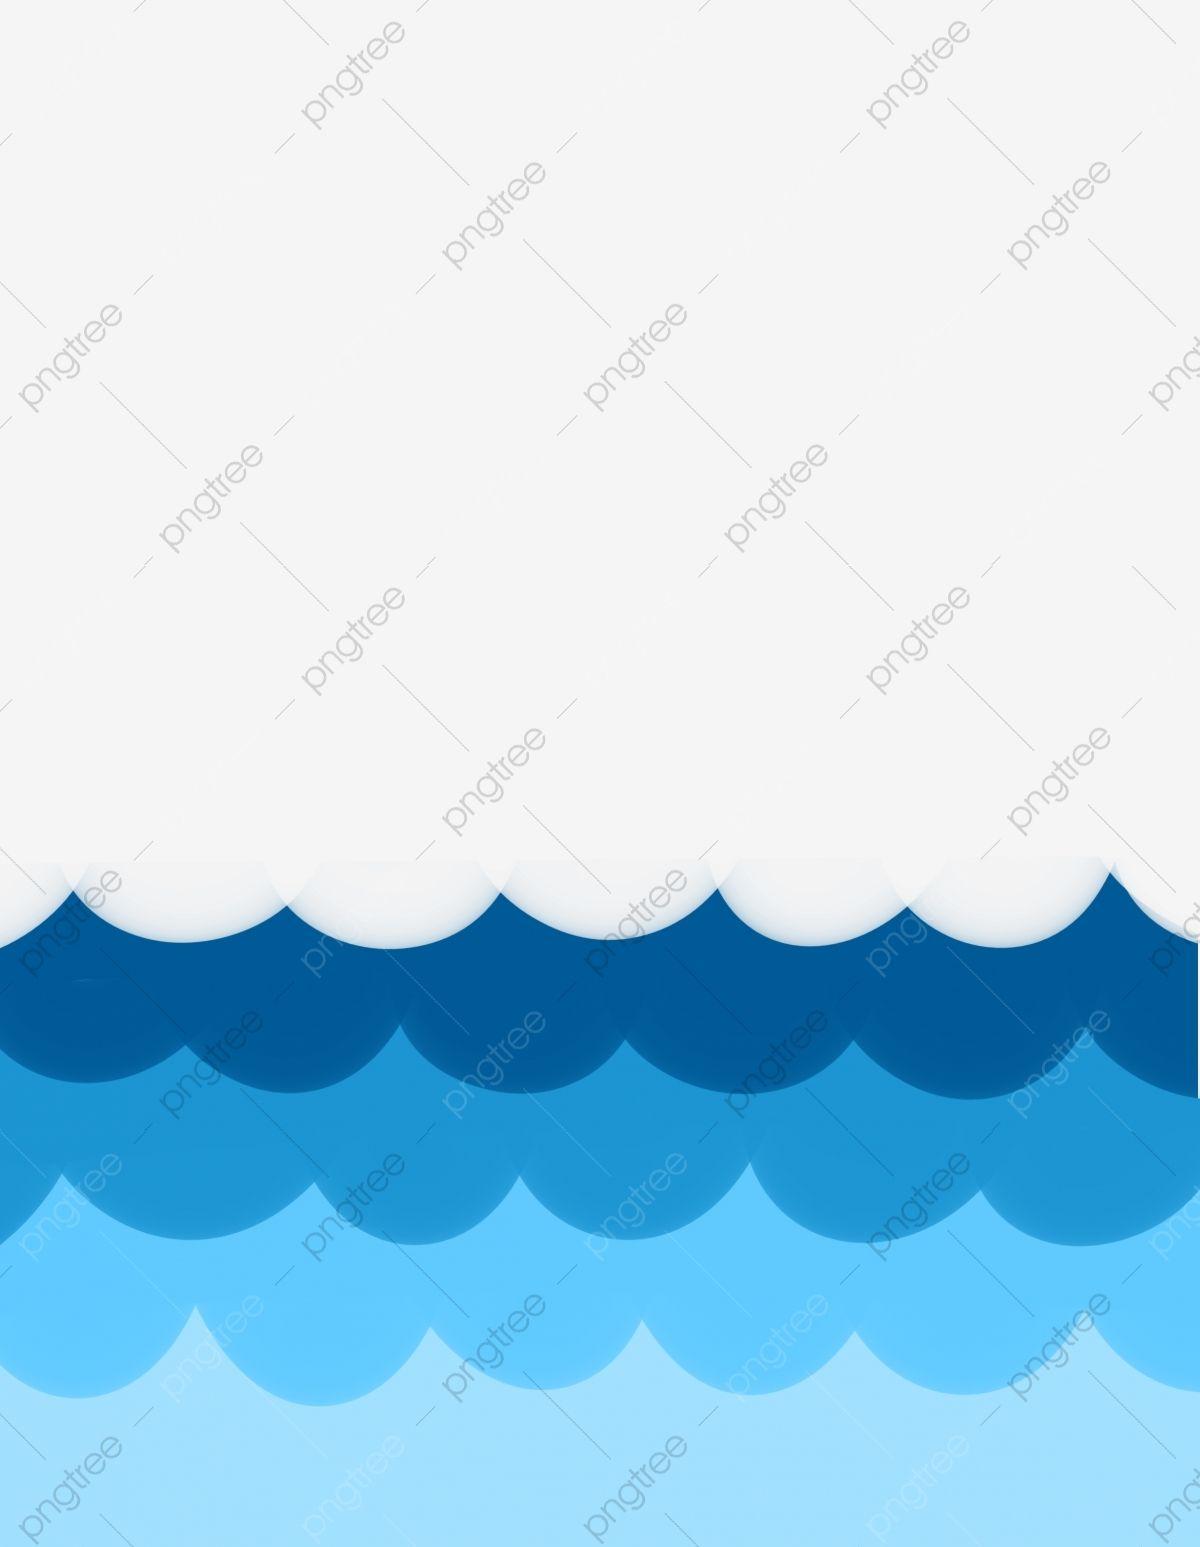 Ocean Waves Clipart Ideas Royalti